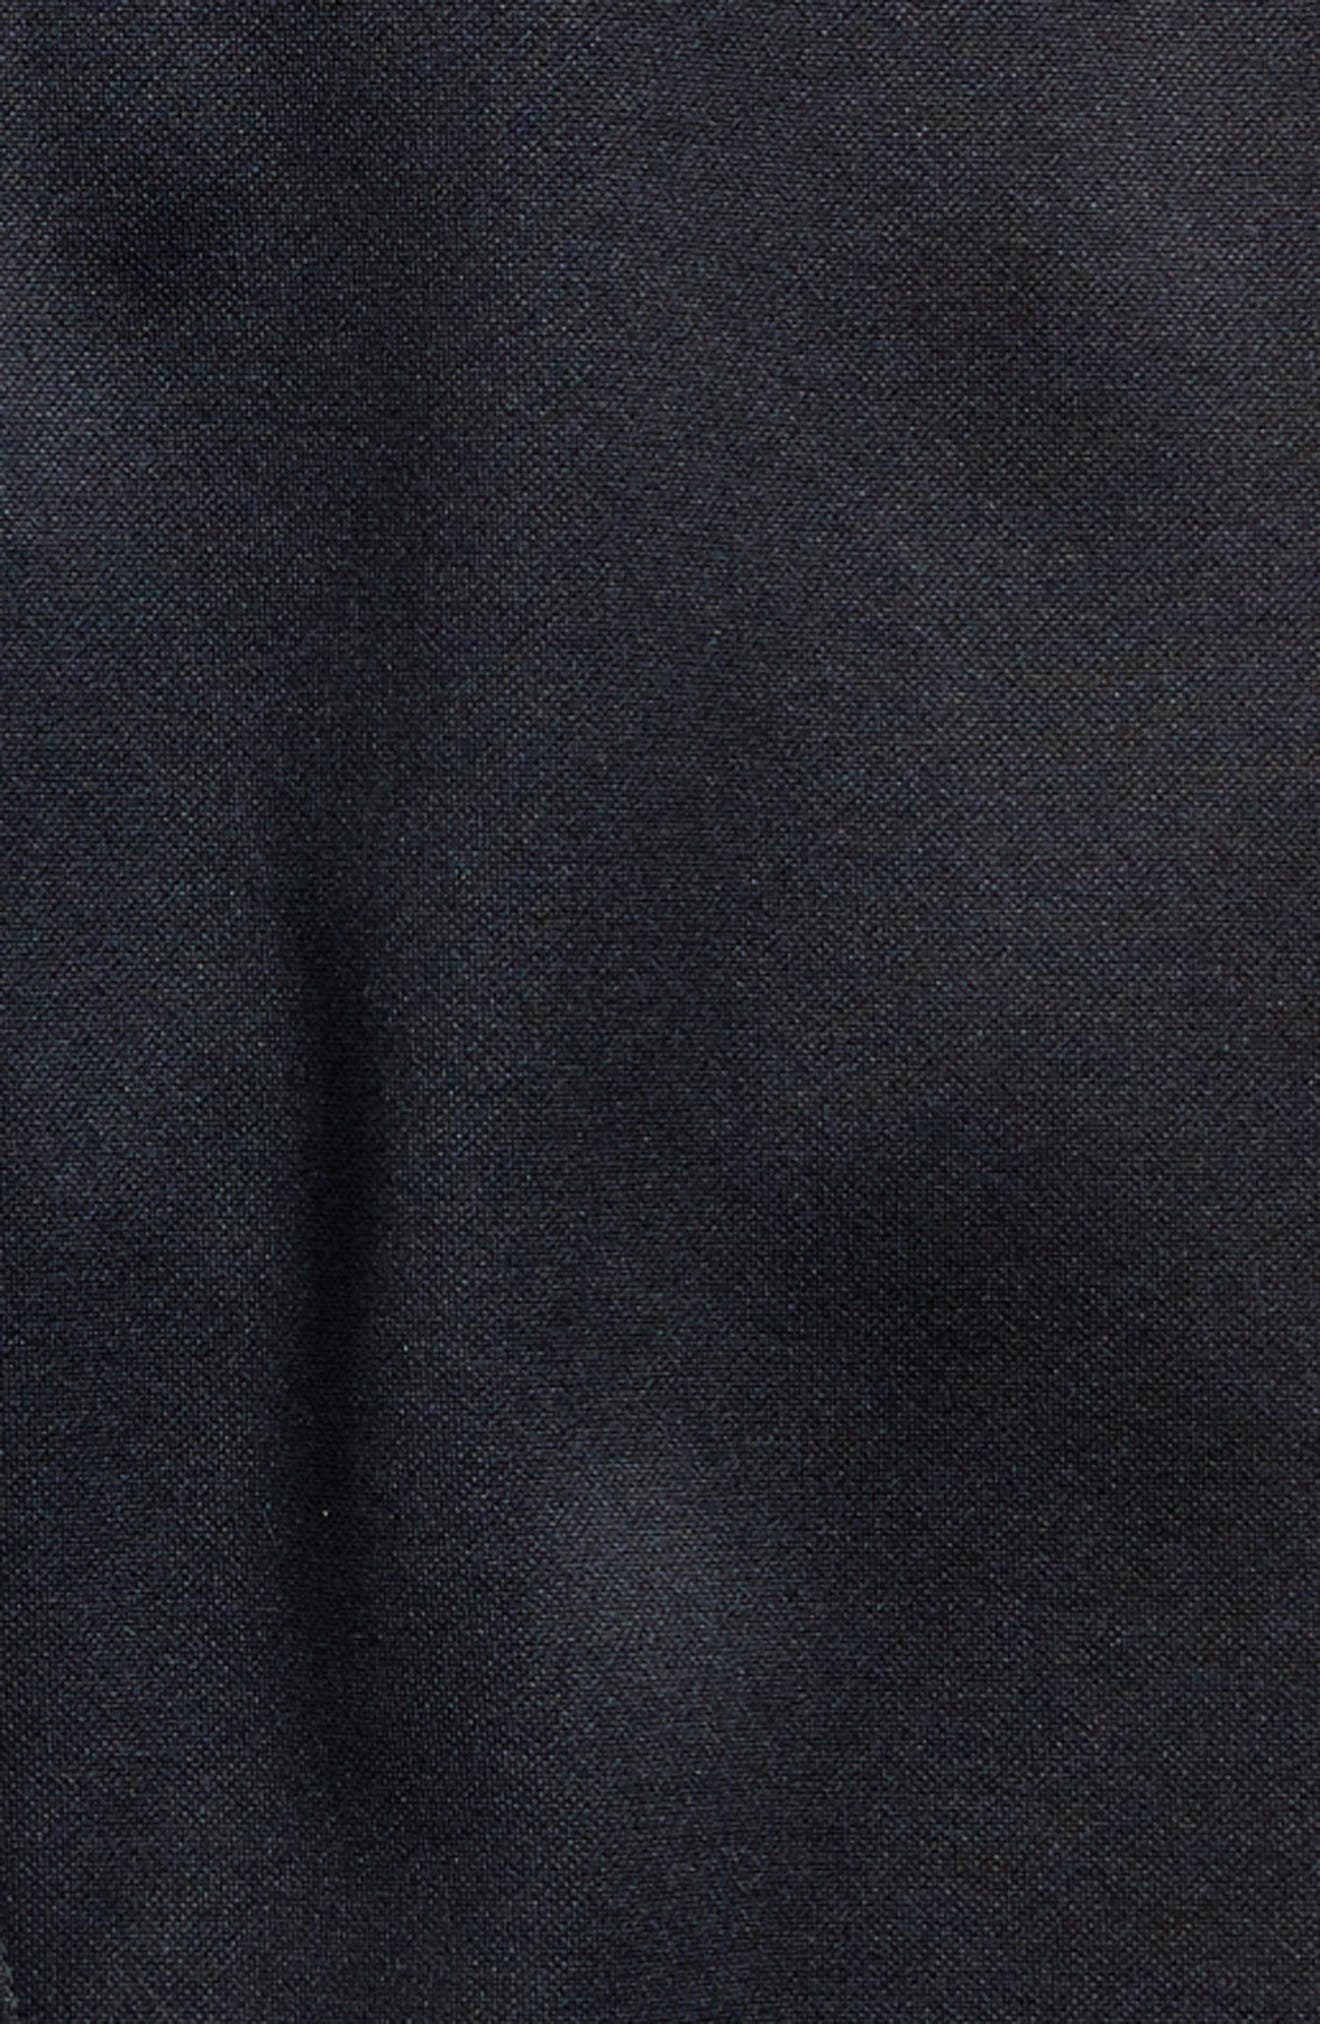 Therma Elite Pants,                             Alternate thumbnail 2, color,                             010